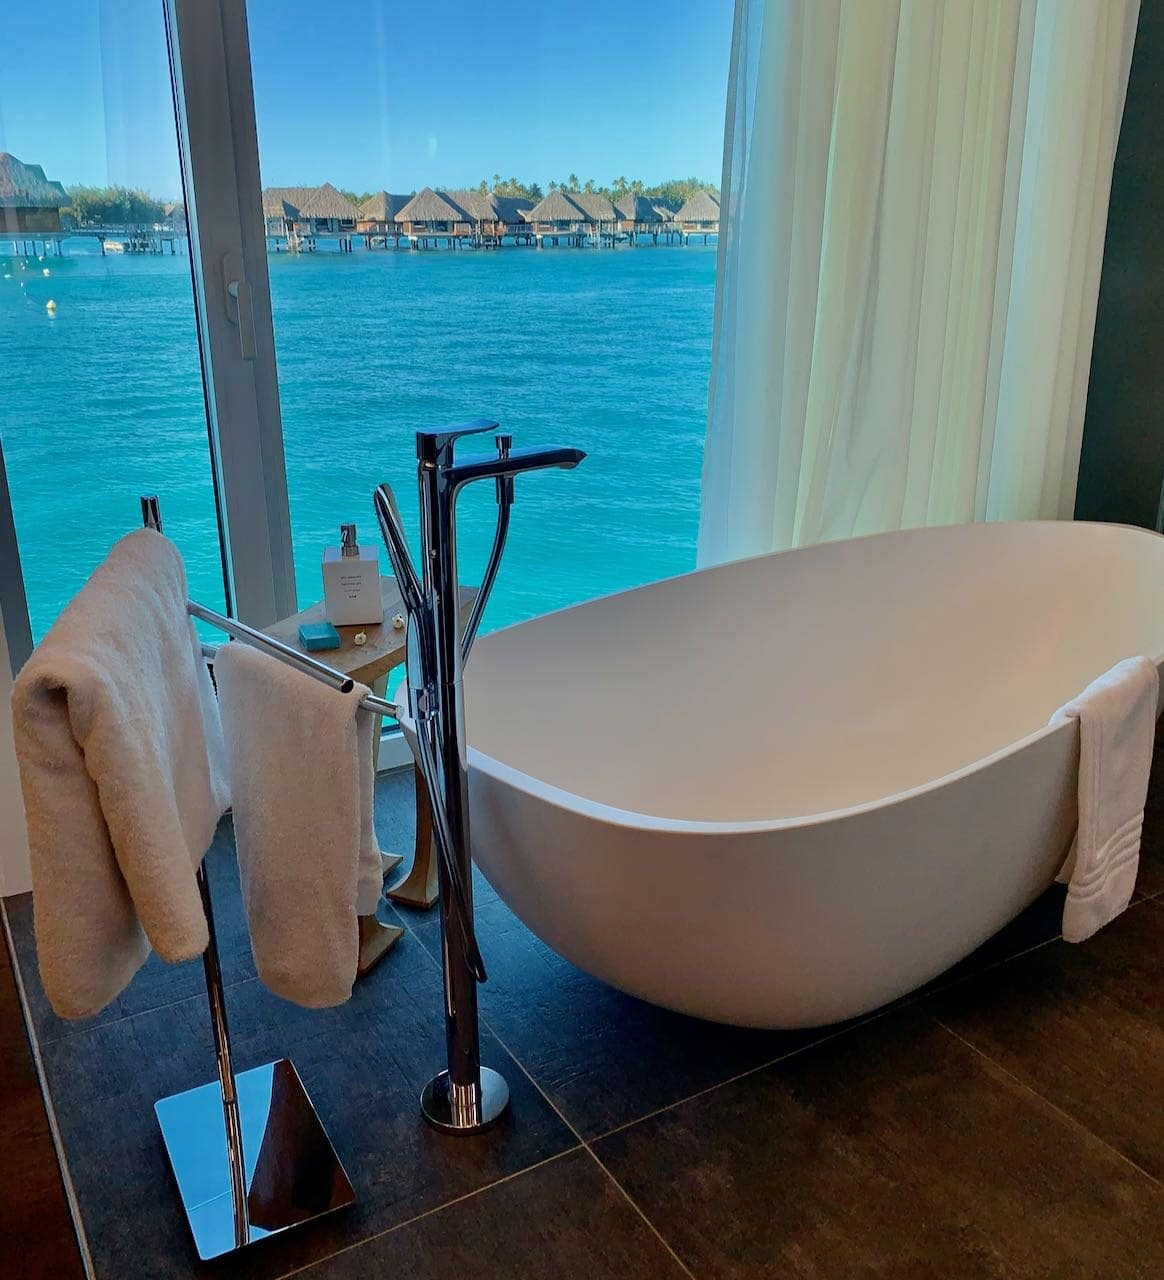 Bathtub The Brando Suite at the InterContinental Bora Bora Thalasso Review